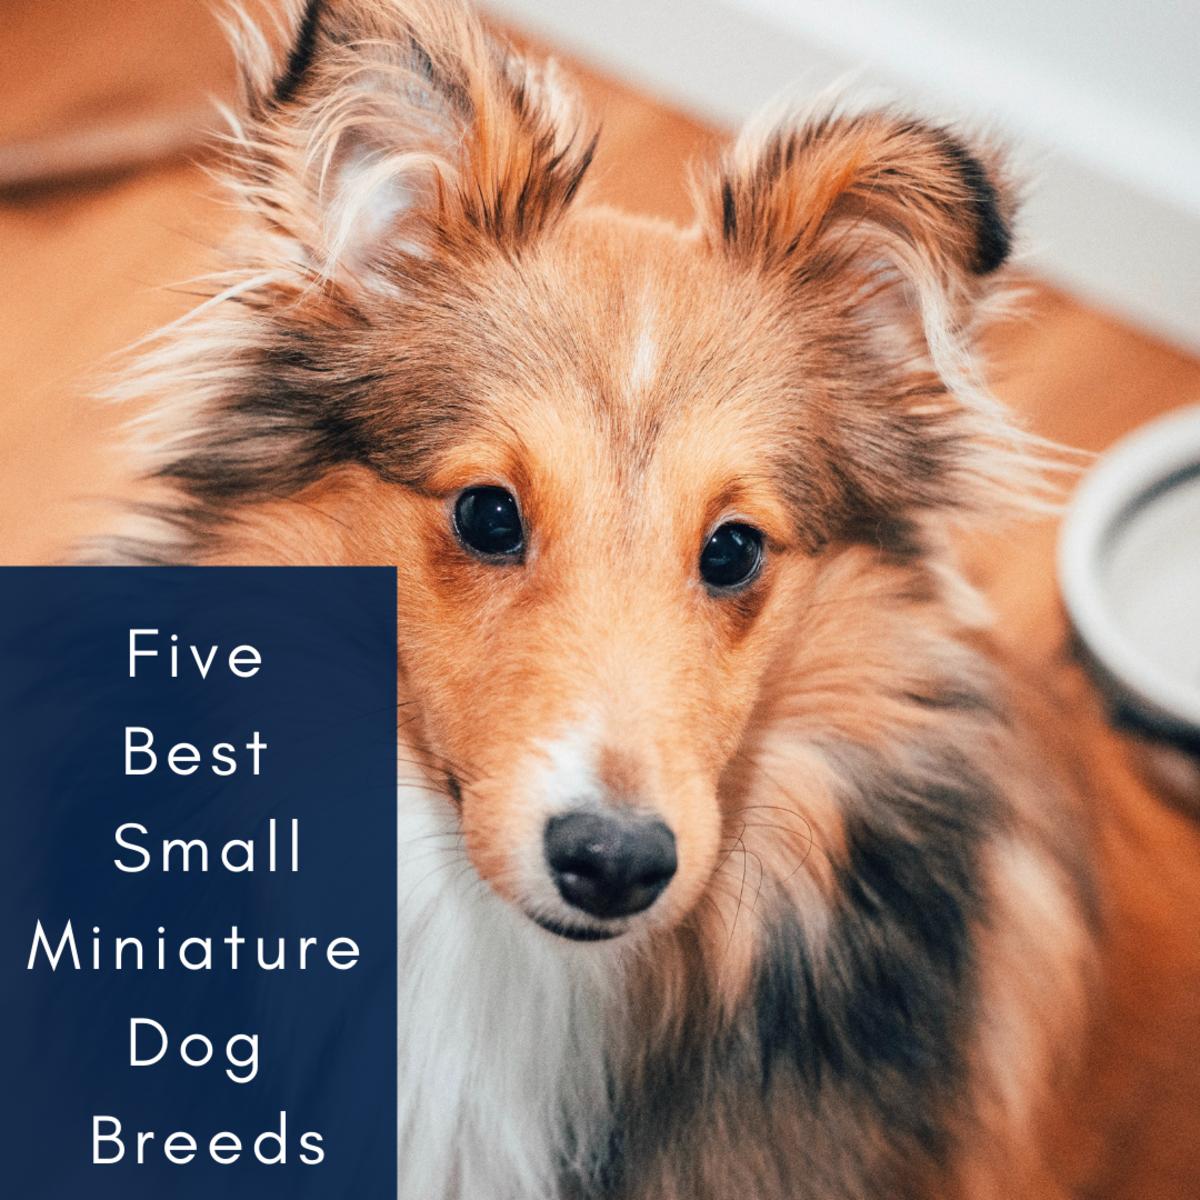 5 Best Small Miniature Dog Breeds